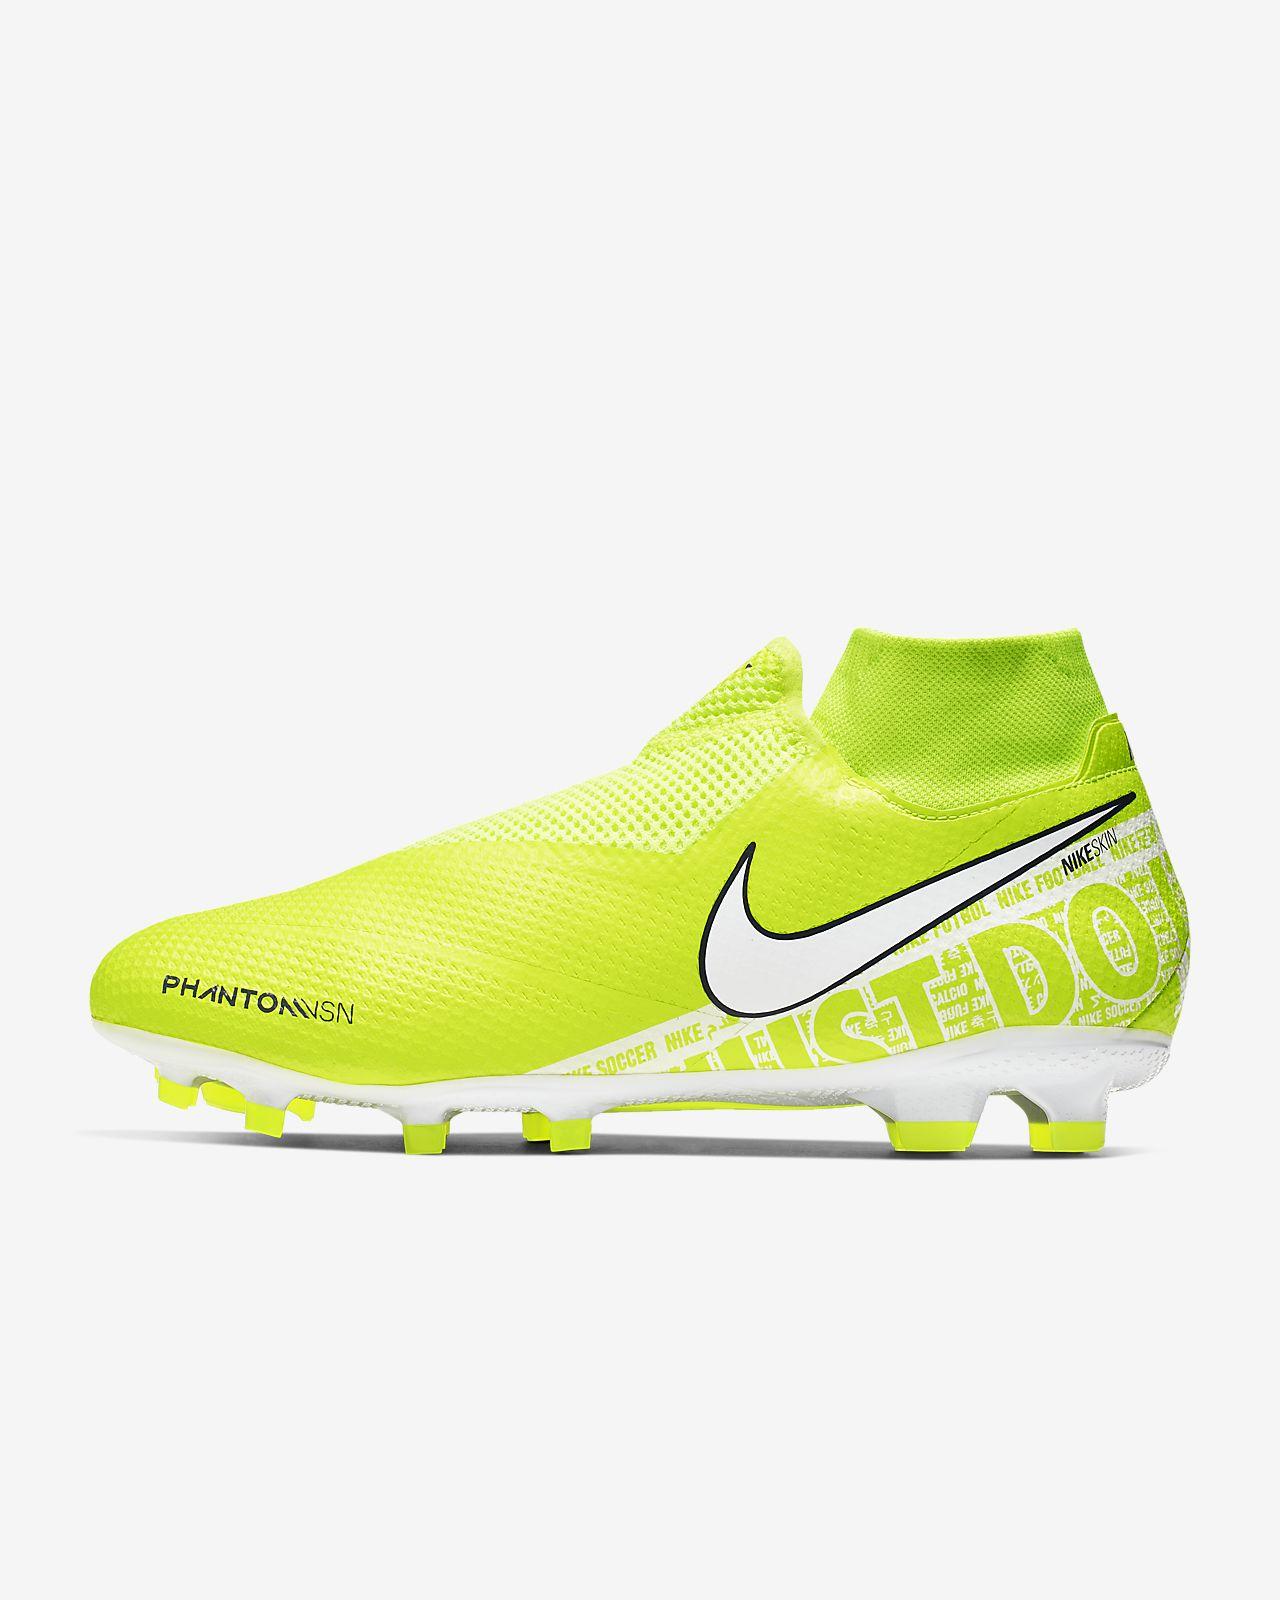 Rasen Vision FG Dynamic Phantom normalen Pro Fußballschuh für Nike Fit BedCWrxo